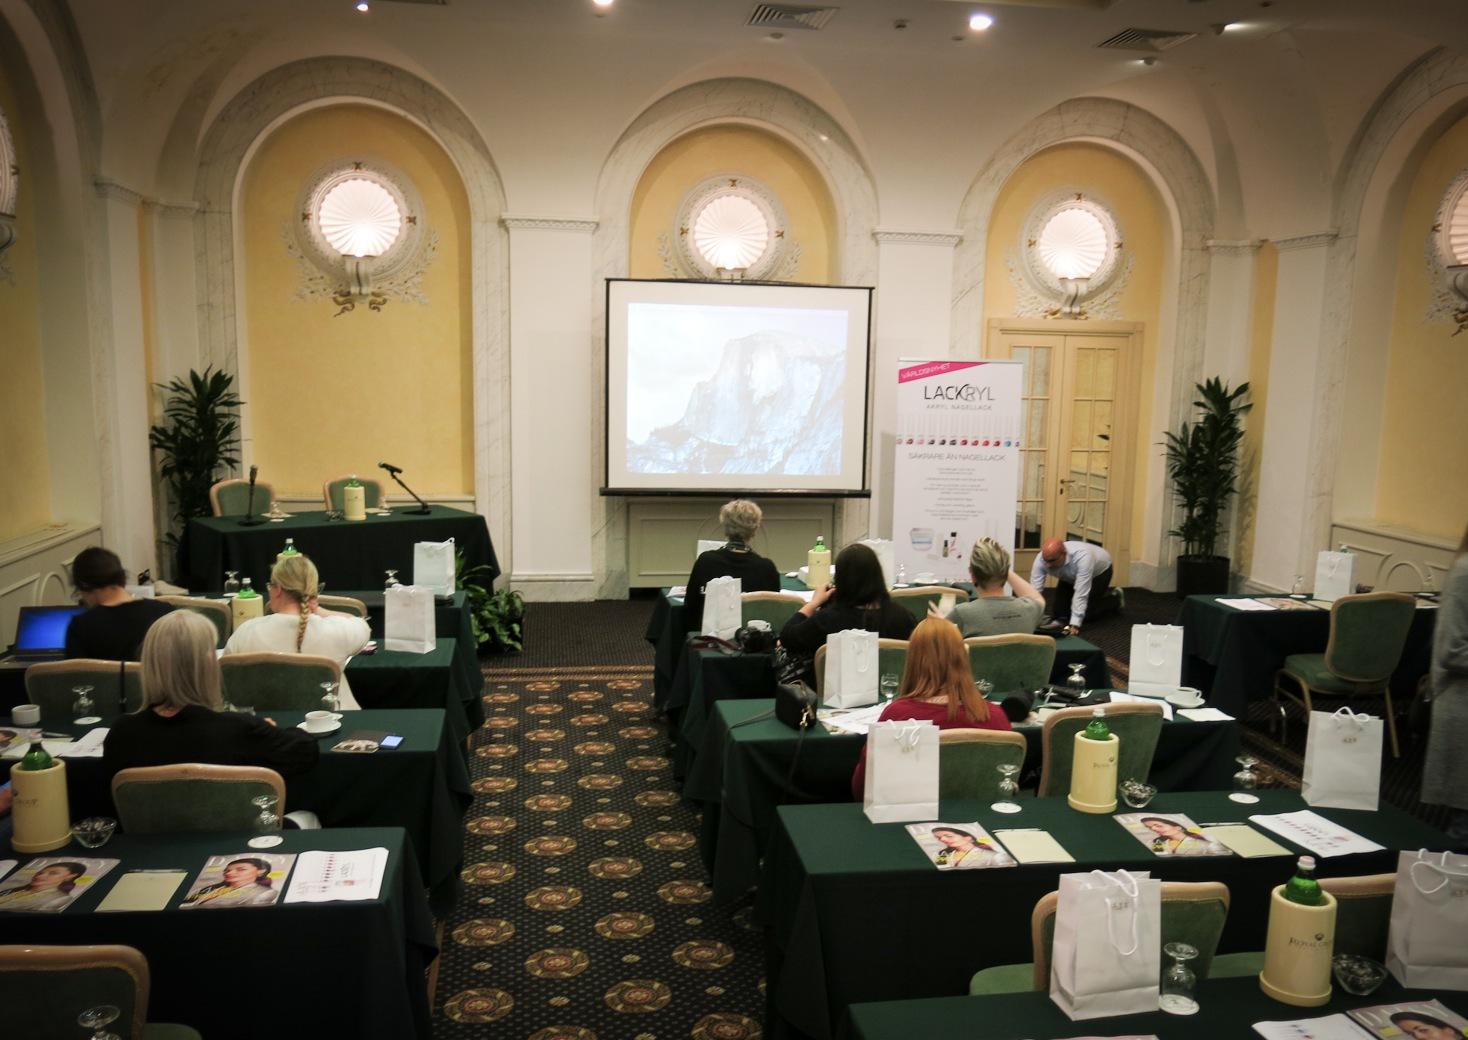 Daisybeautys skönhetskonferens 2016 går av stapeln i Rom